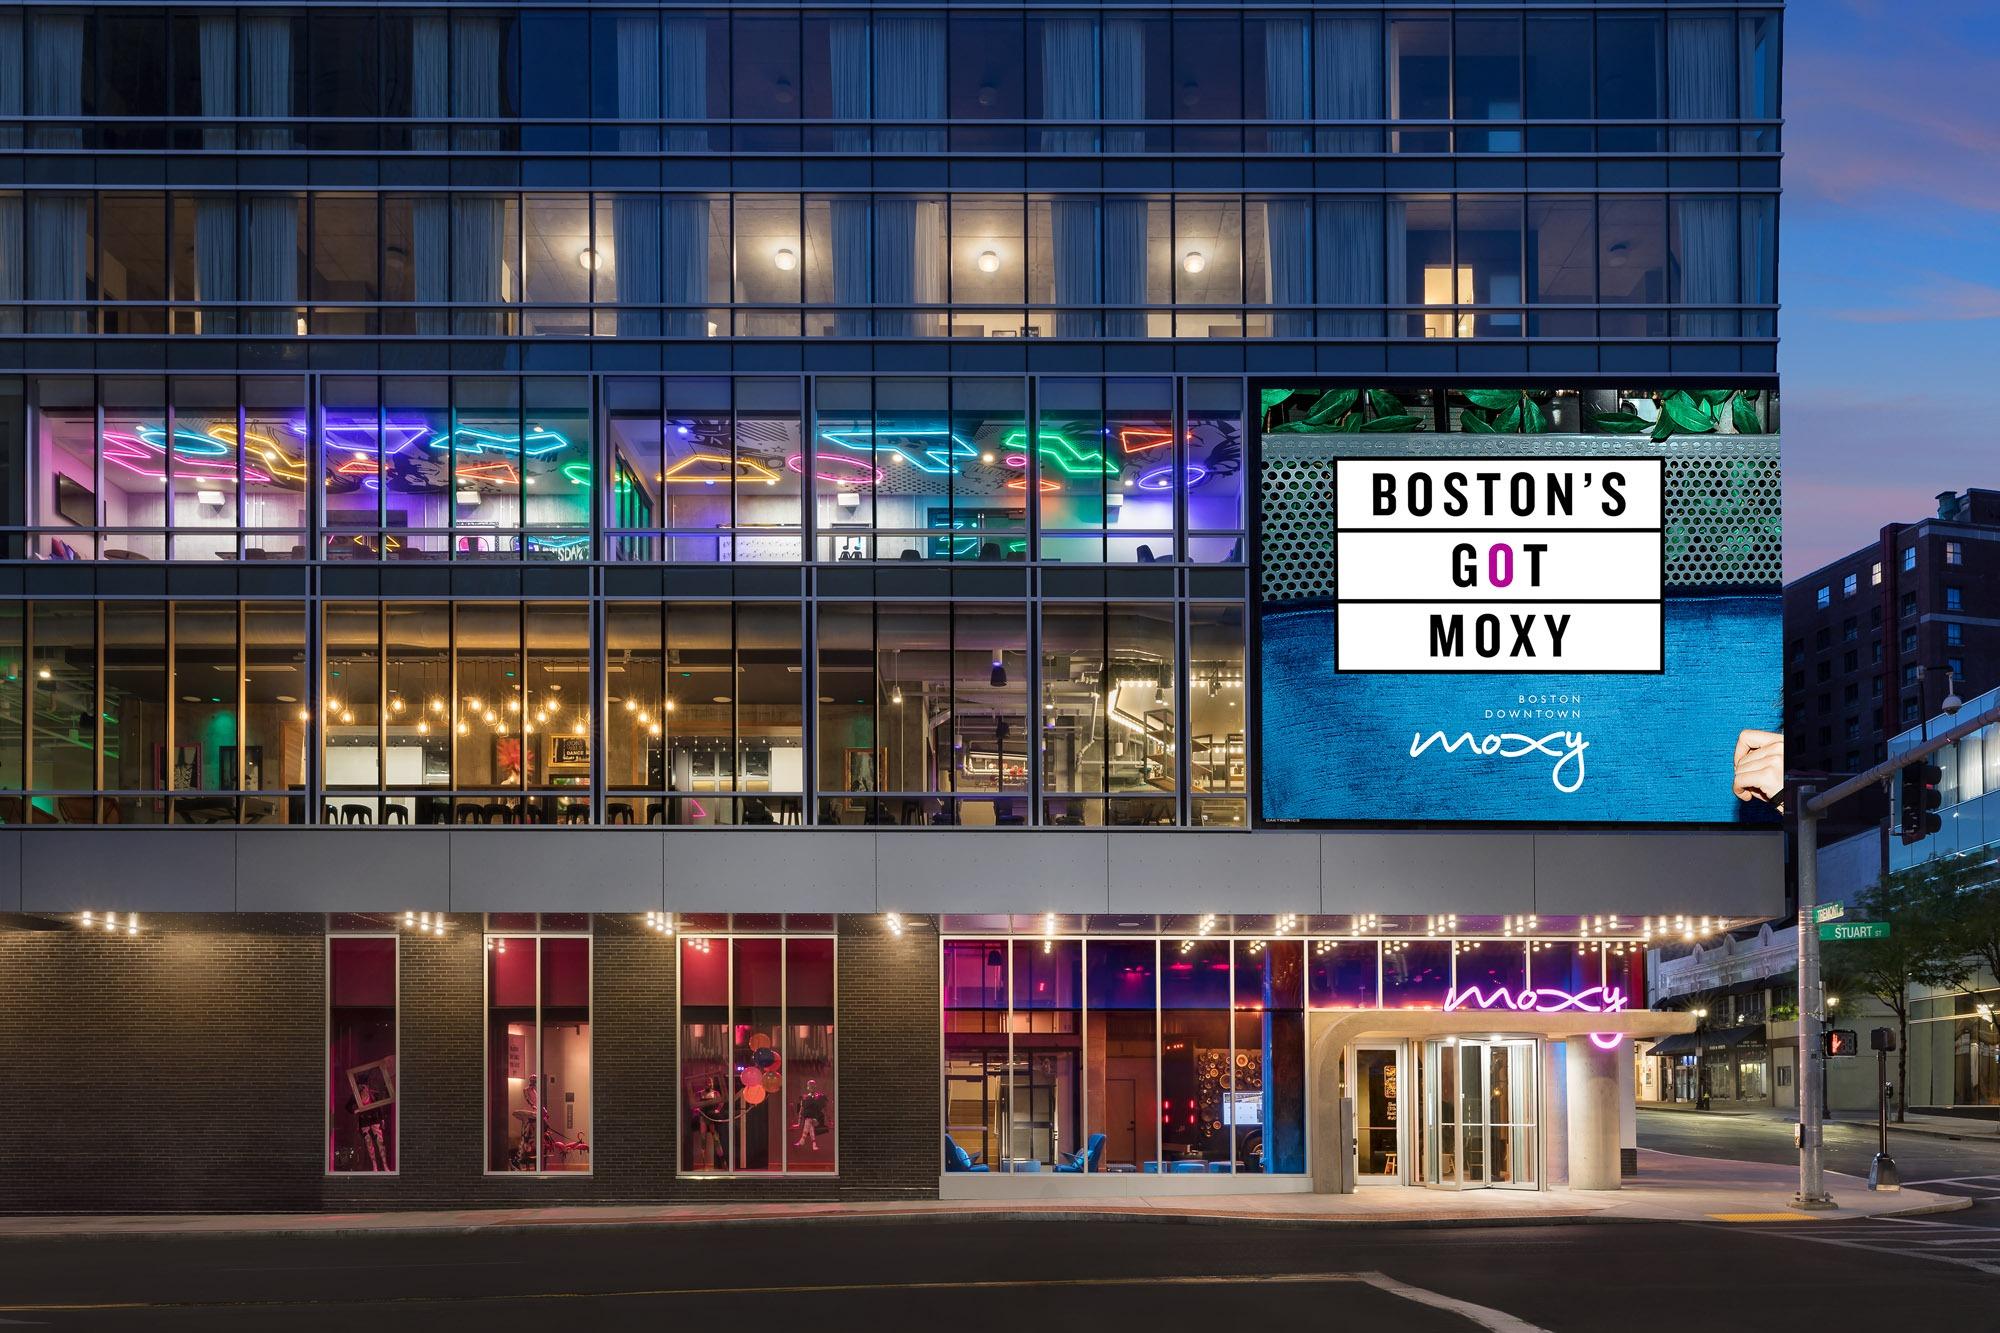 Moxy Boston Exterior